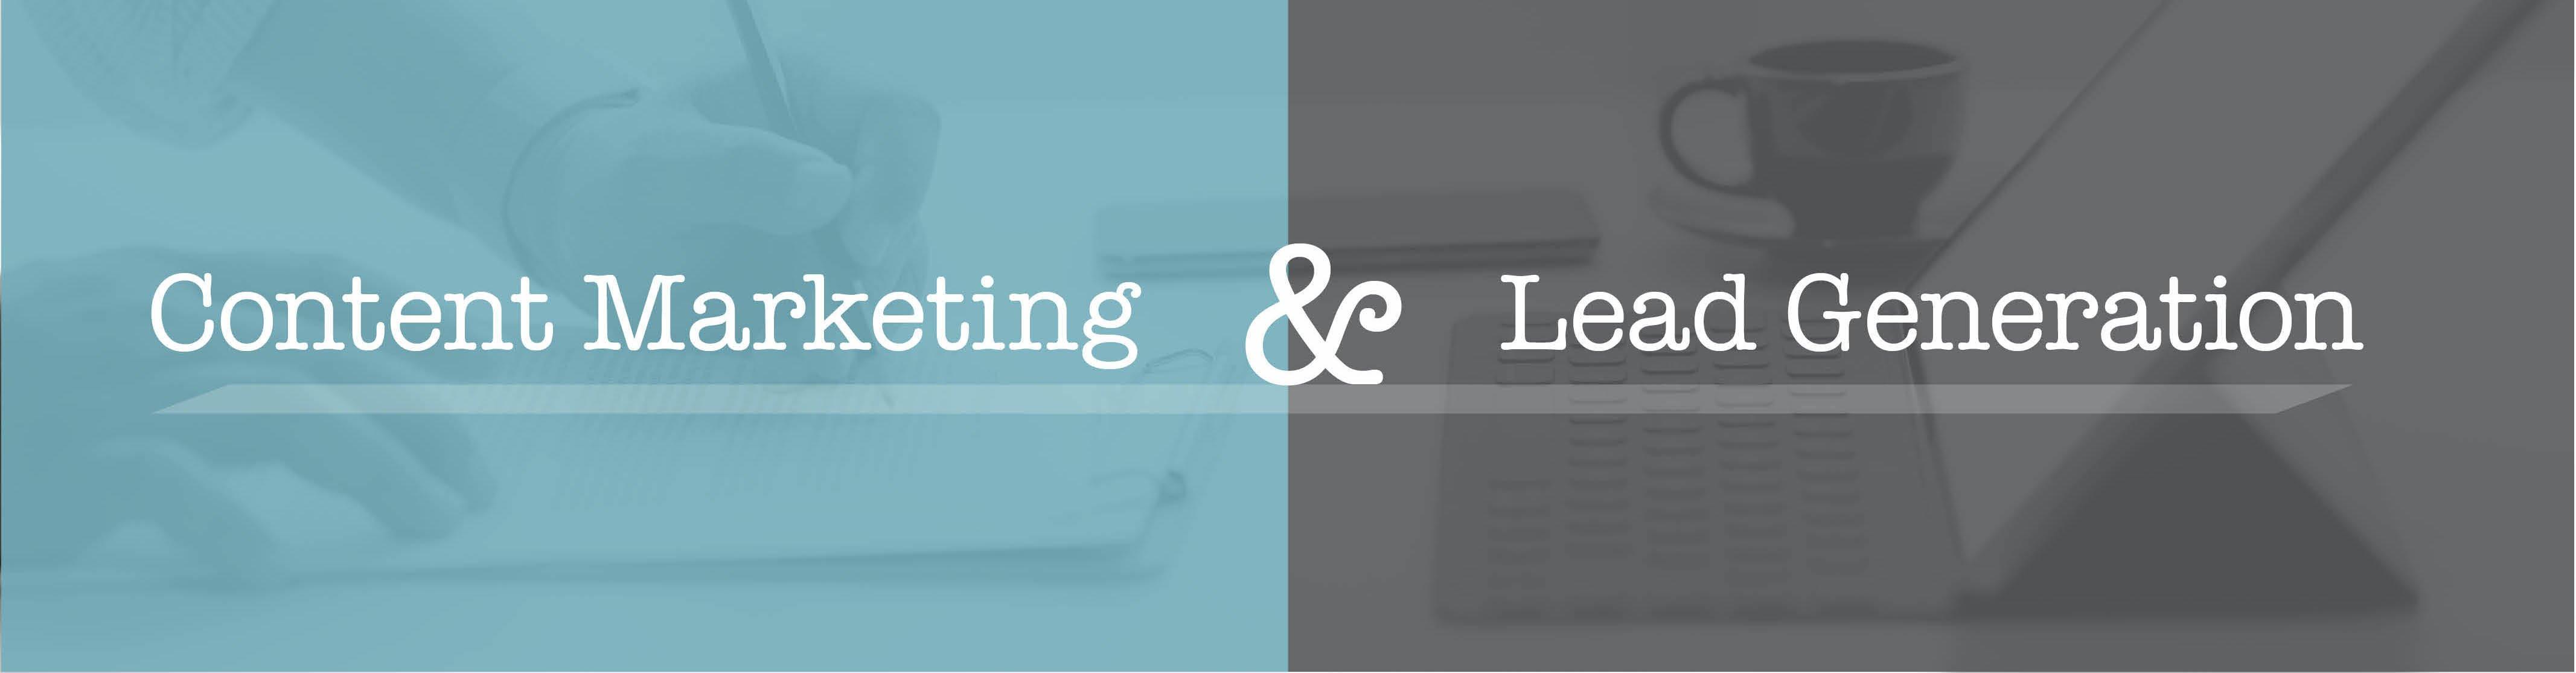 content marketing & lead generation